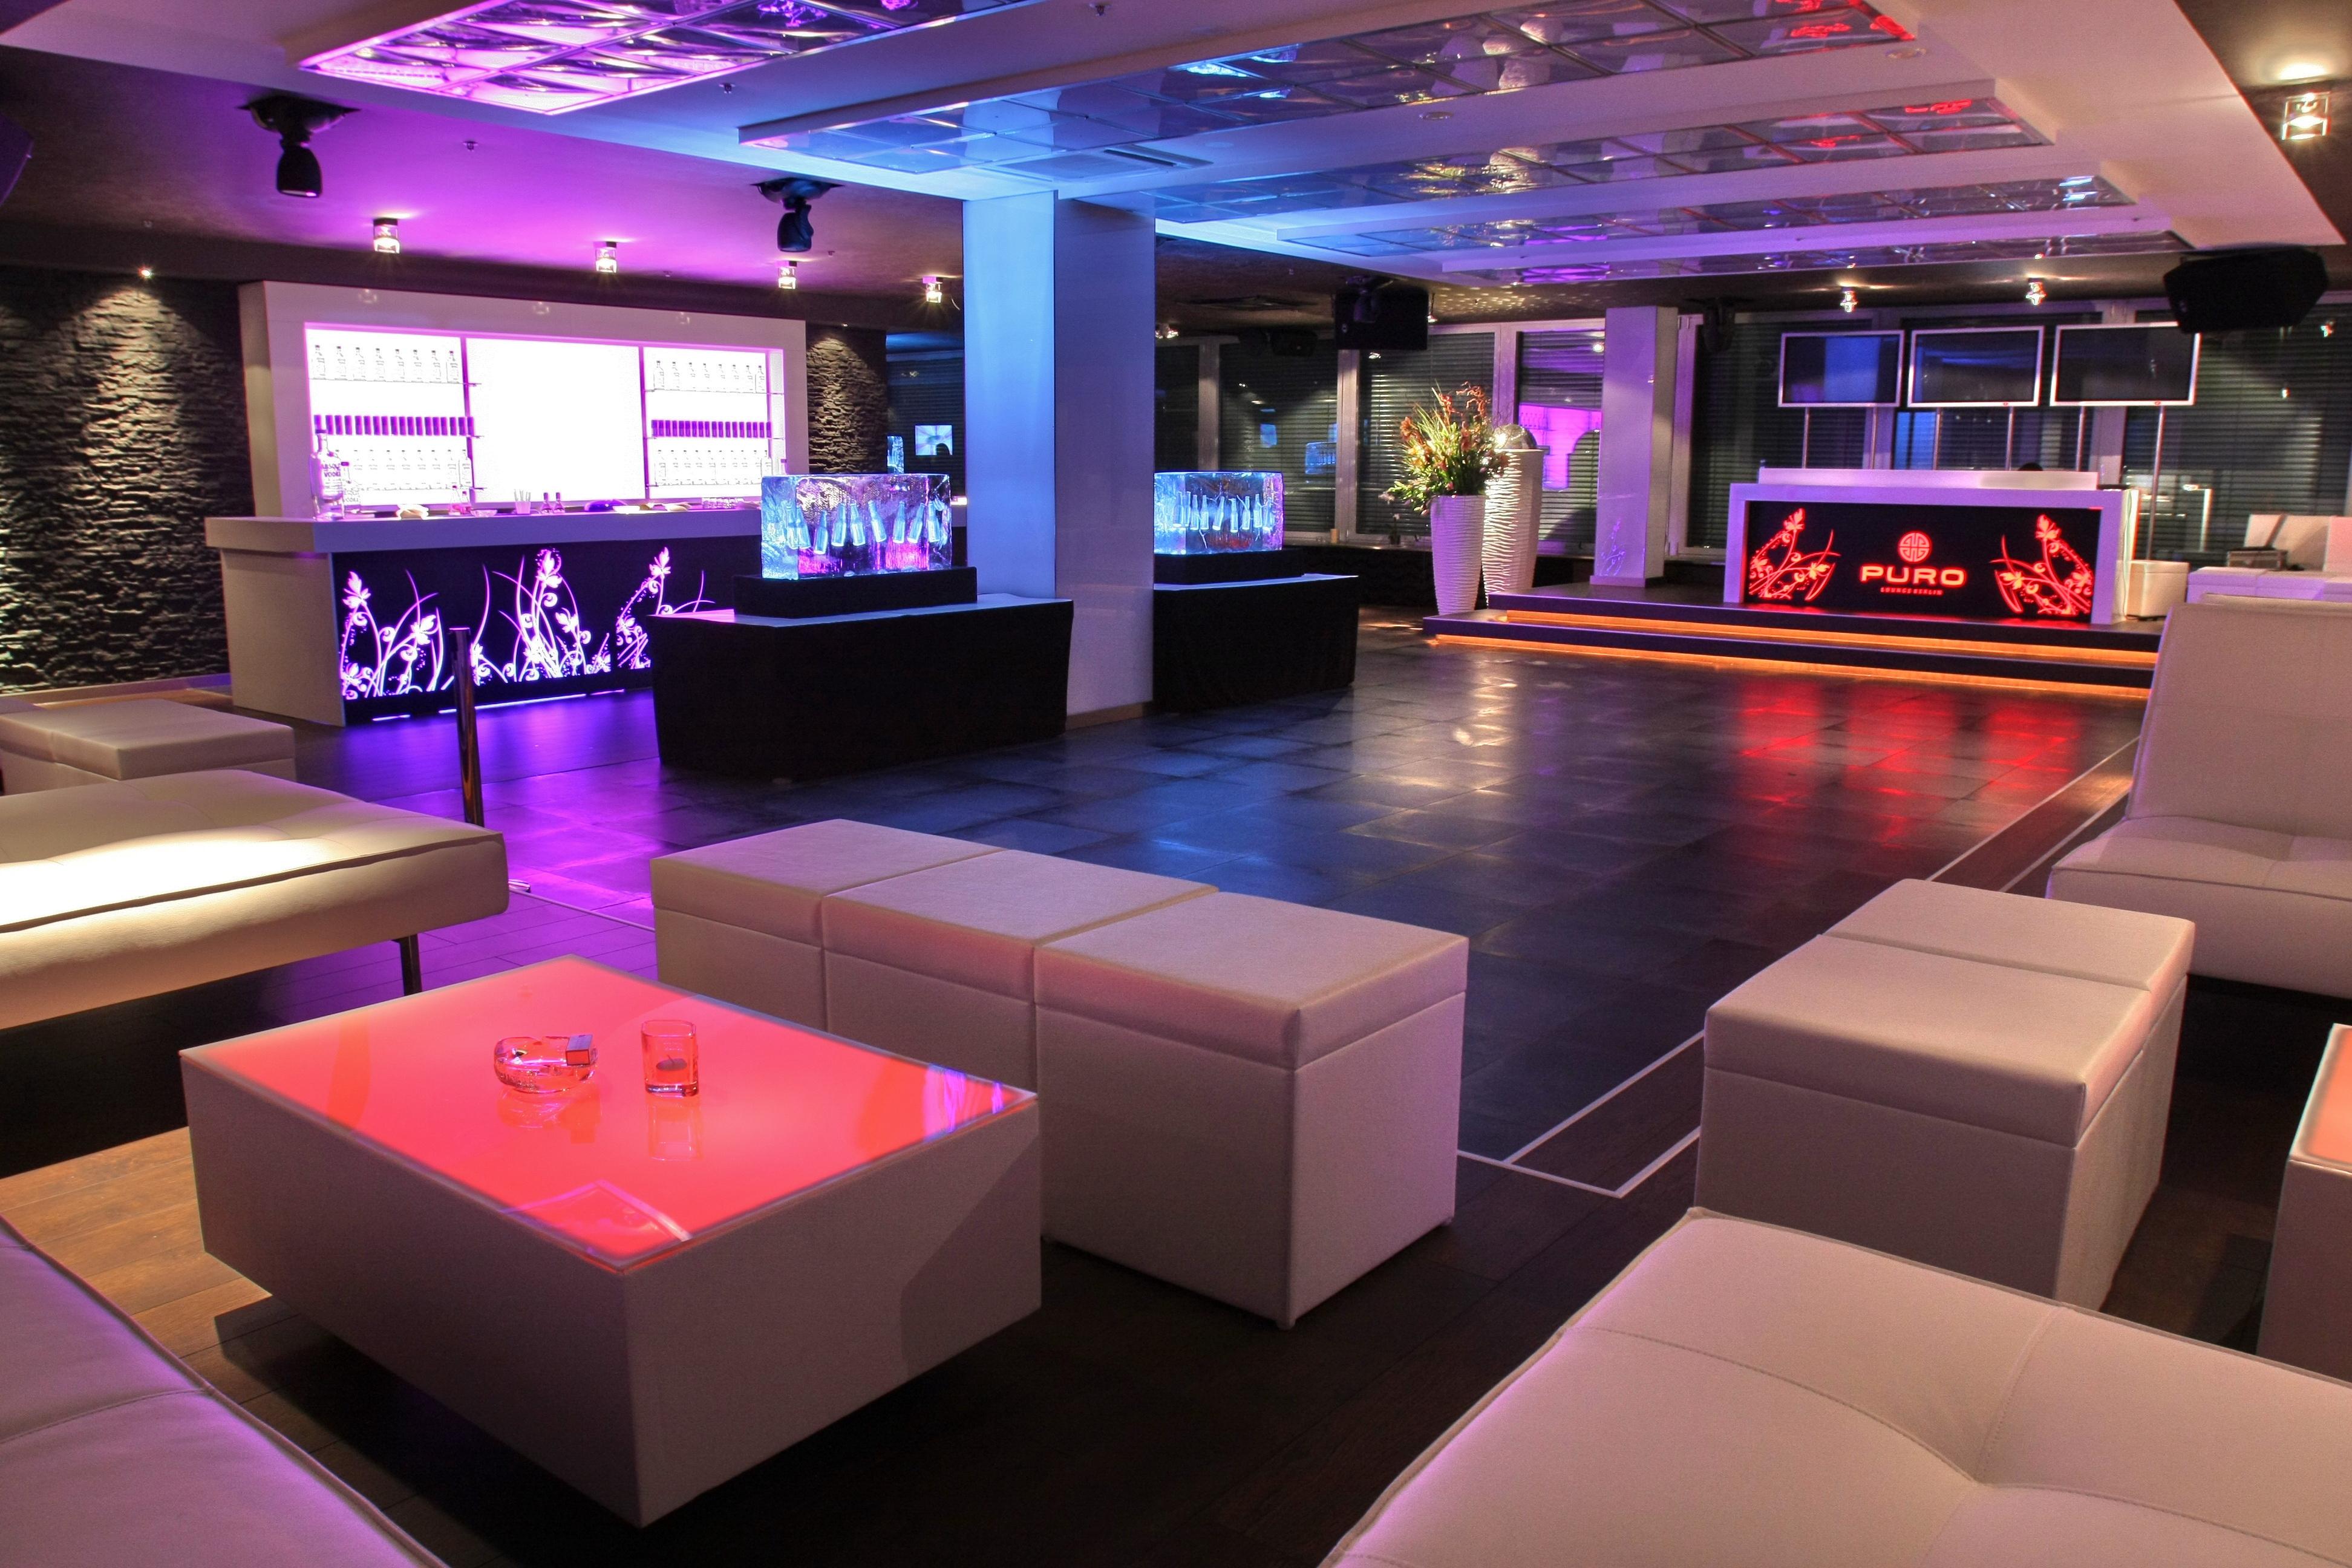 Puro Sky Lounge2